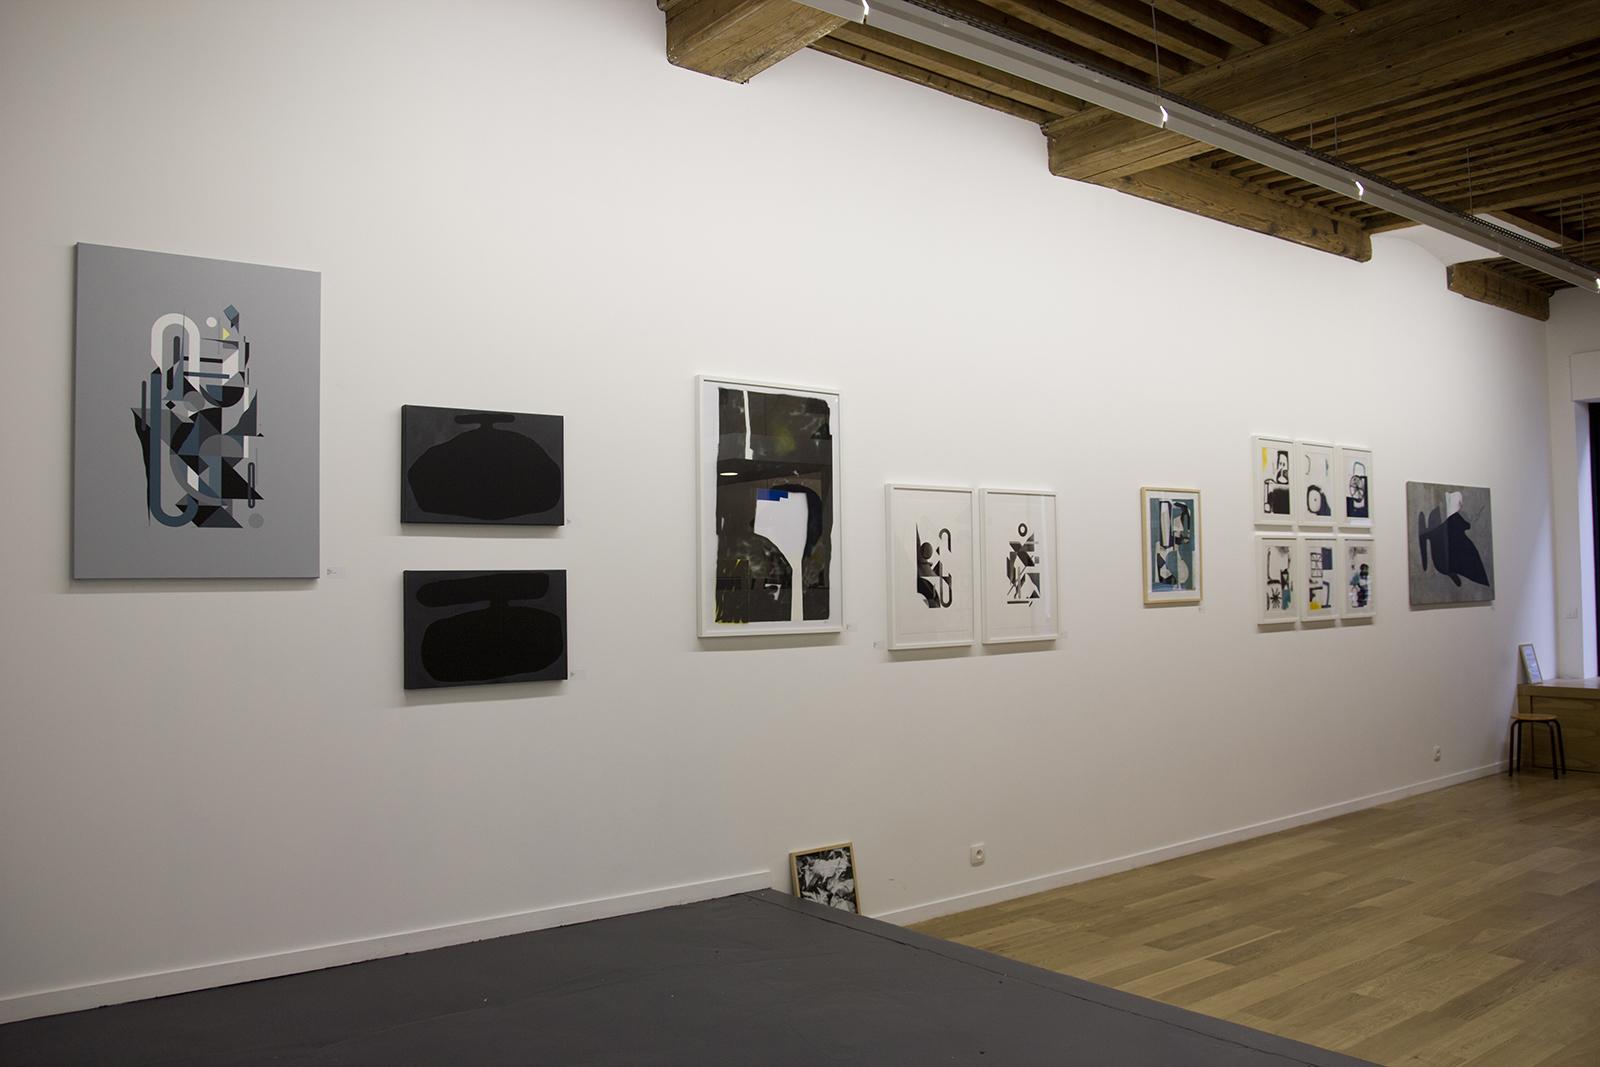 108-ekta-erosie-nelio-at-galerie-slika-recap-05